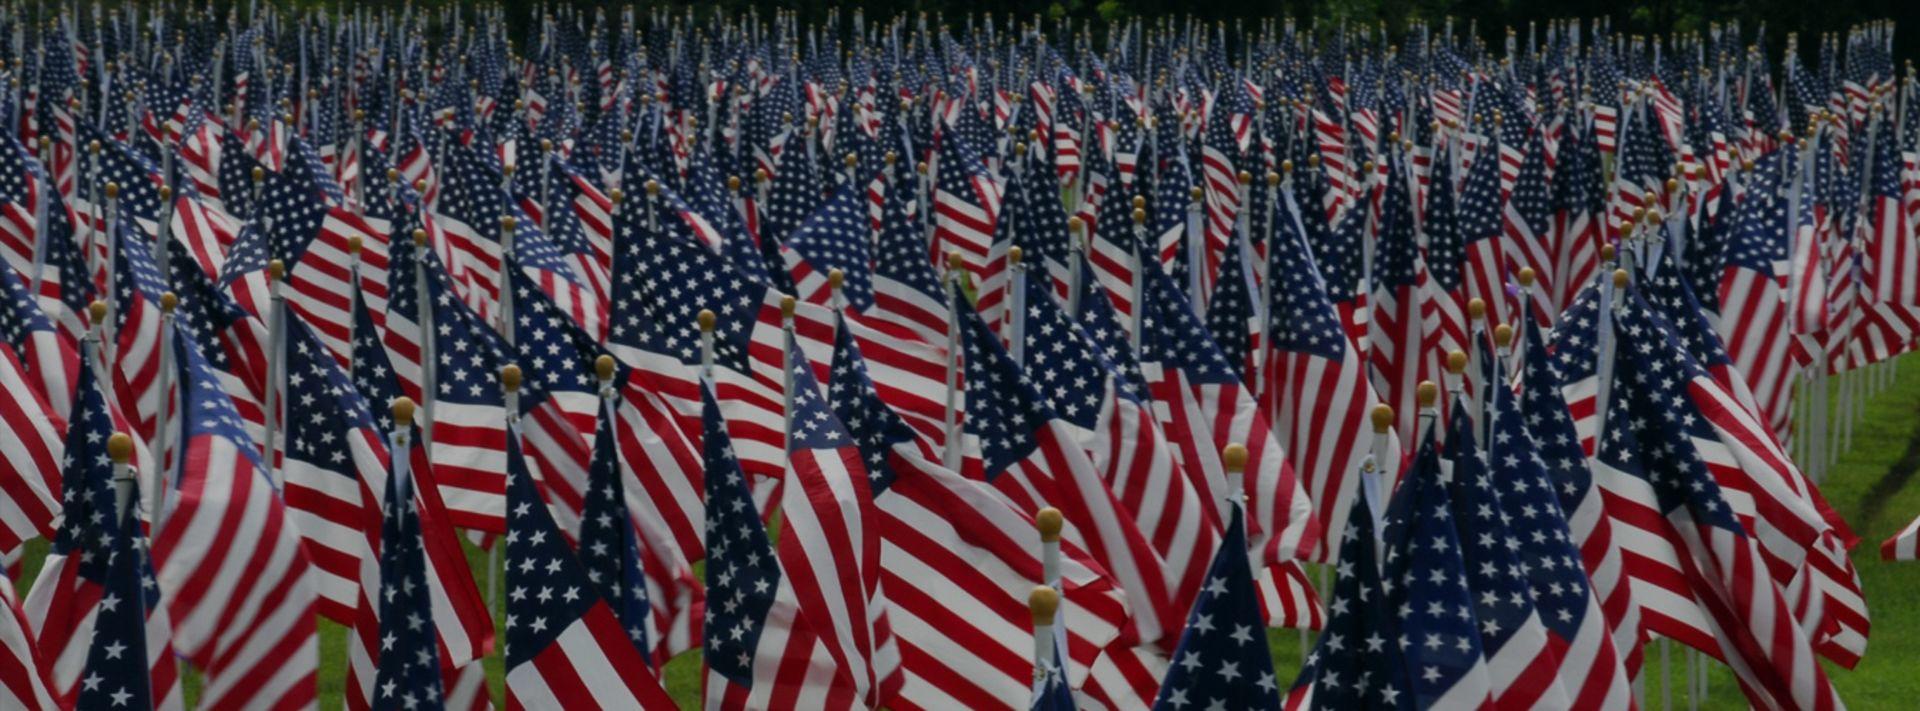 Go Enjoy The Memorial Day Parade near you!